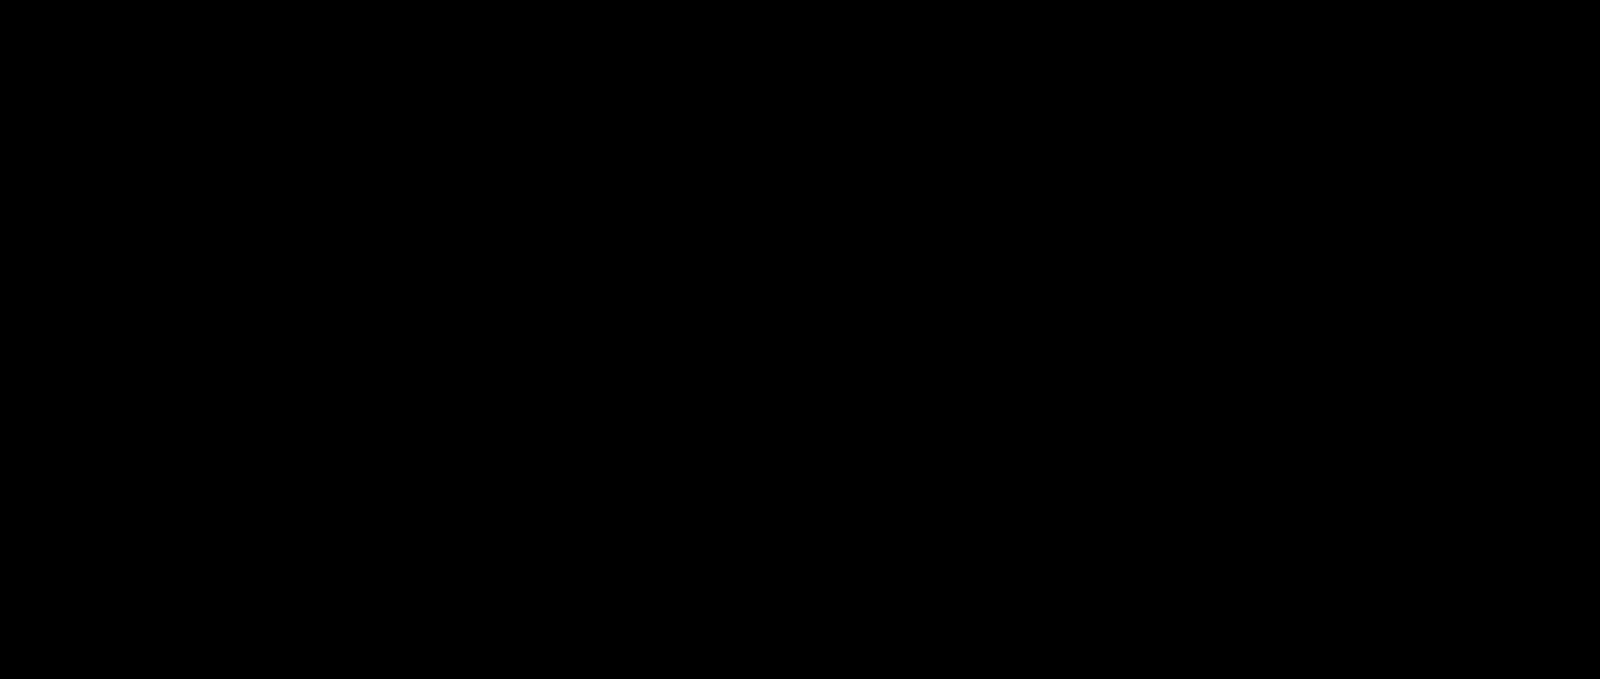 cM info logo